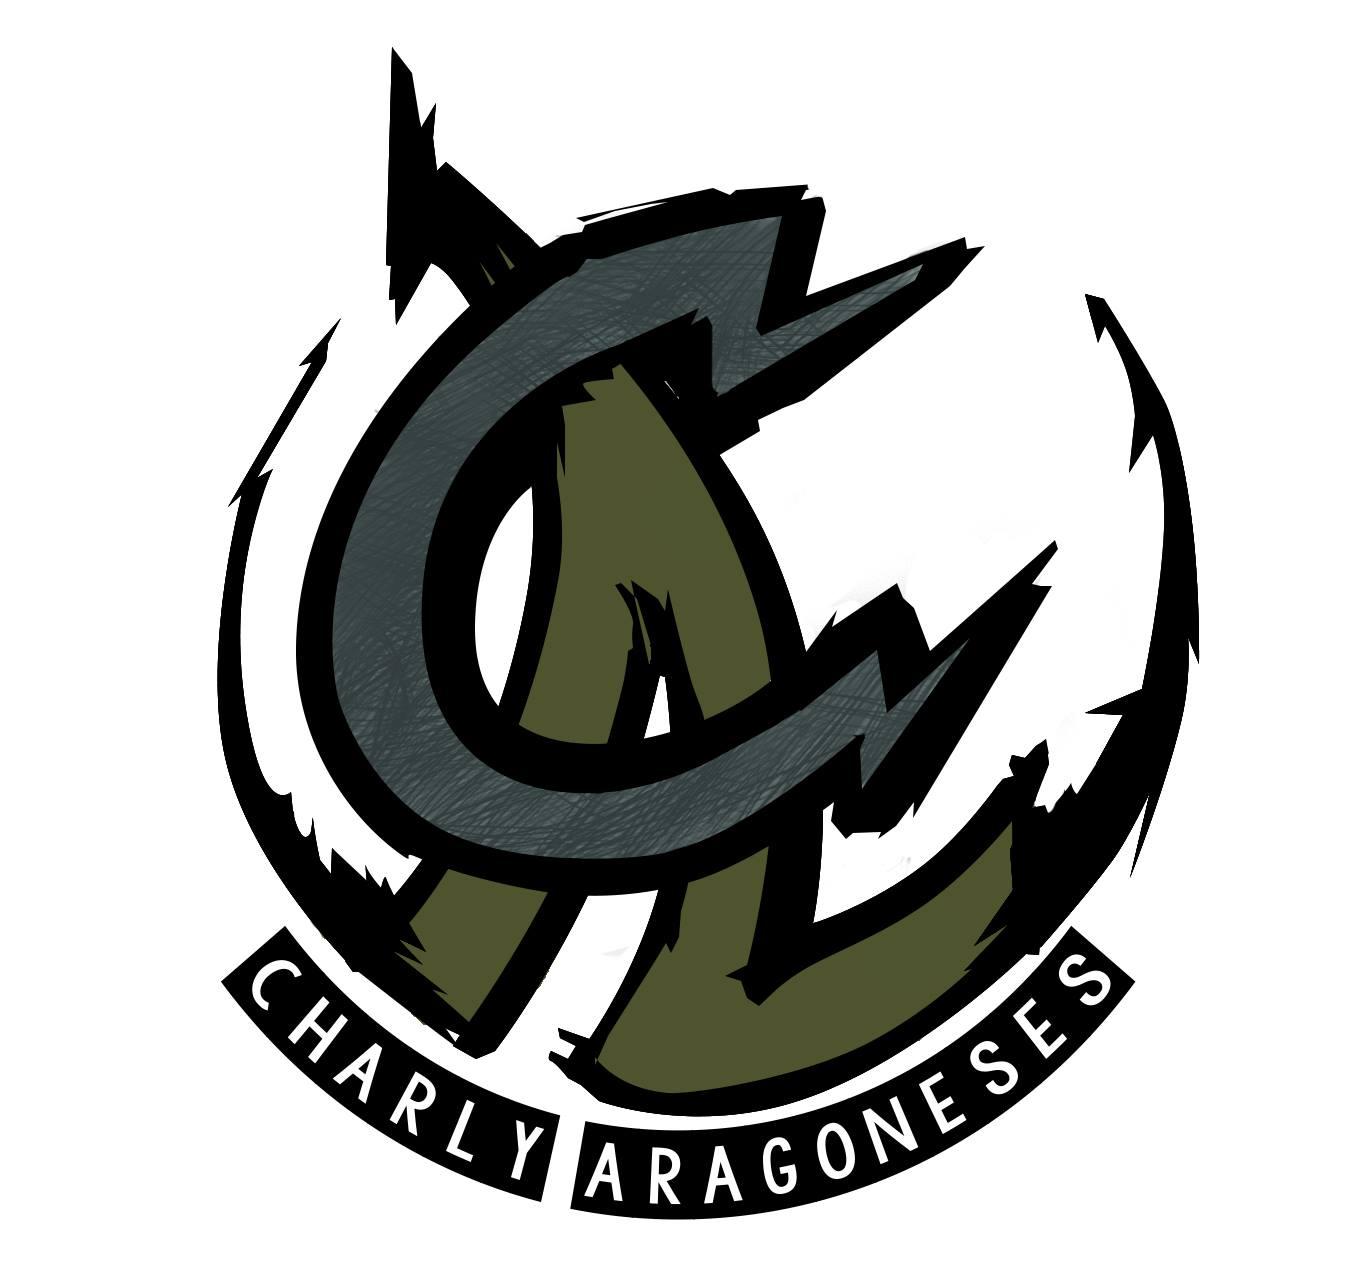 Charly Aragoneses